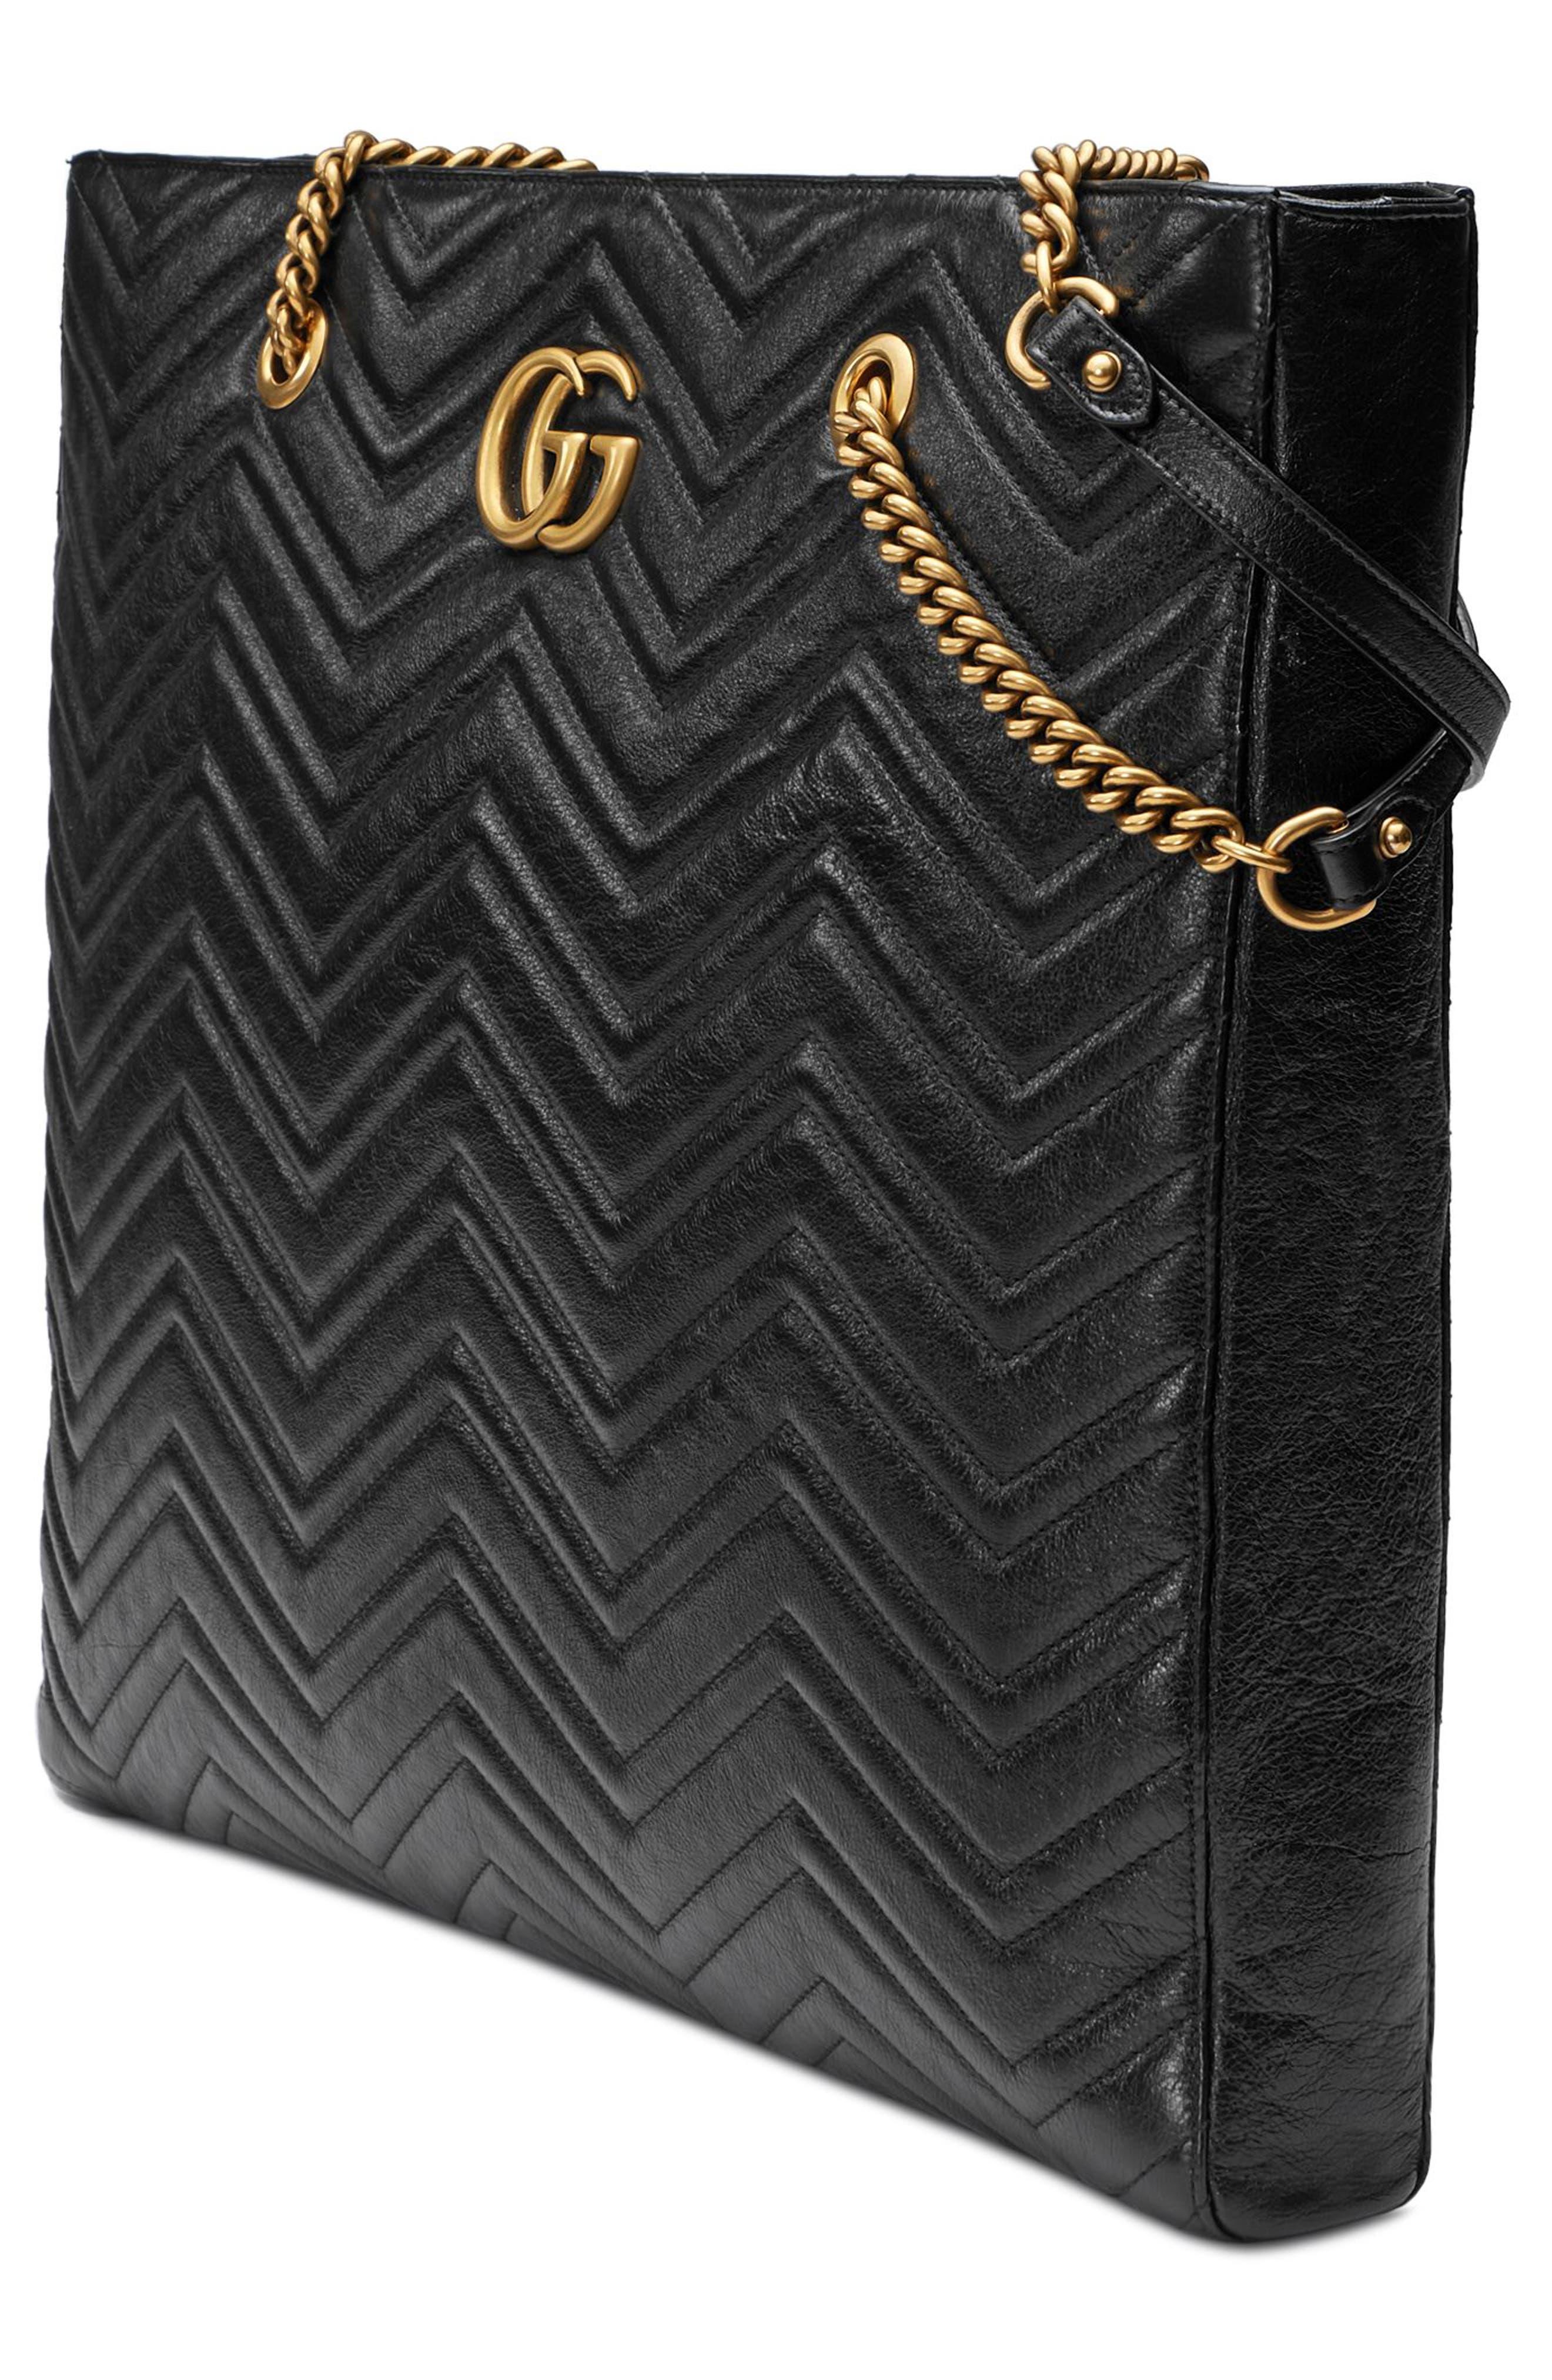 GG Marmont 2.0 Matelassé Leather North/South Tote Bag,                             Alternate thumbnail 4, color,                             NERO/ NERO